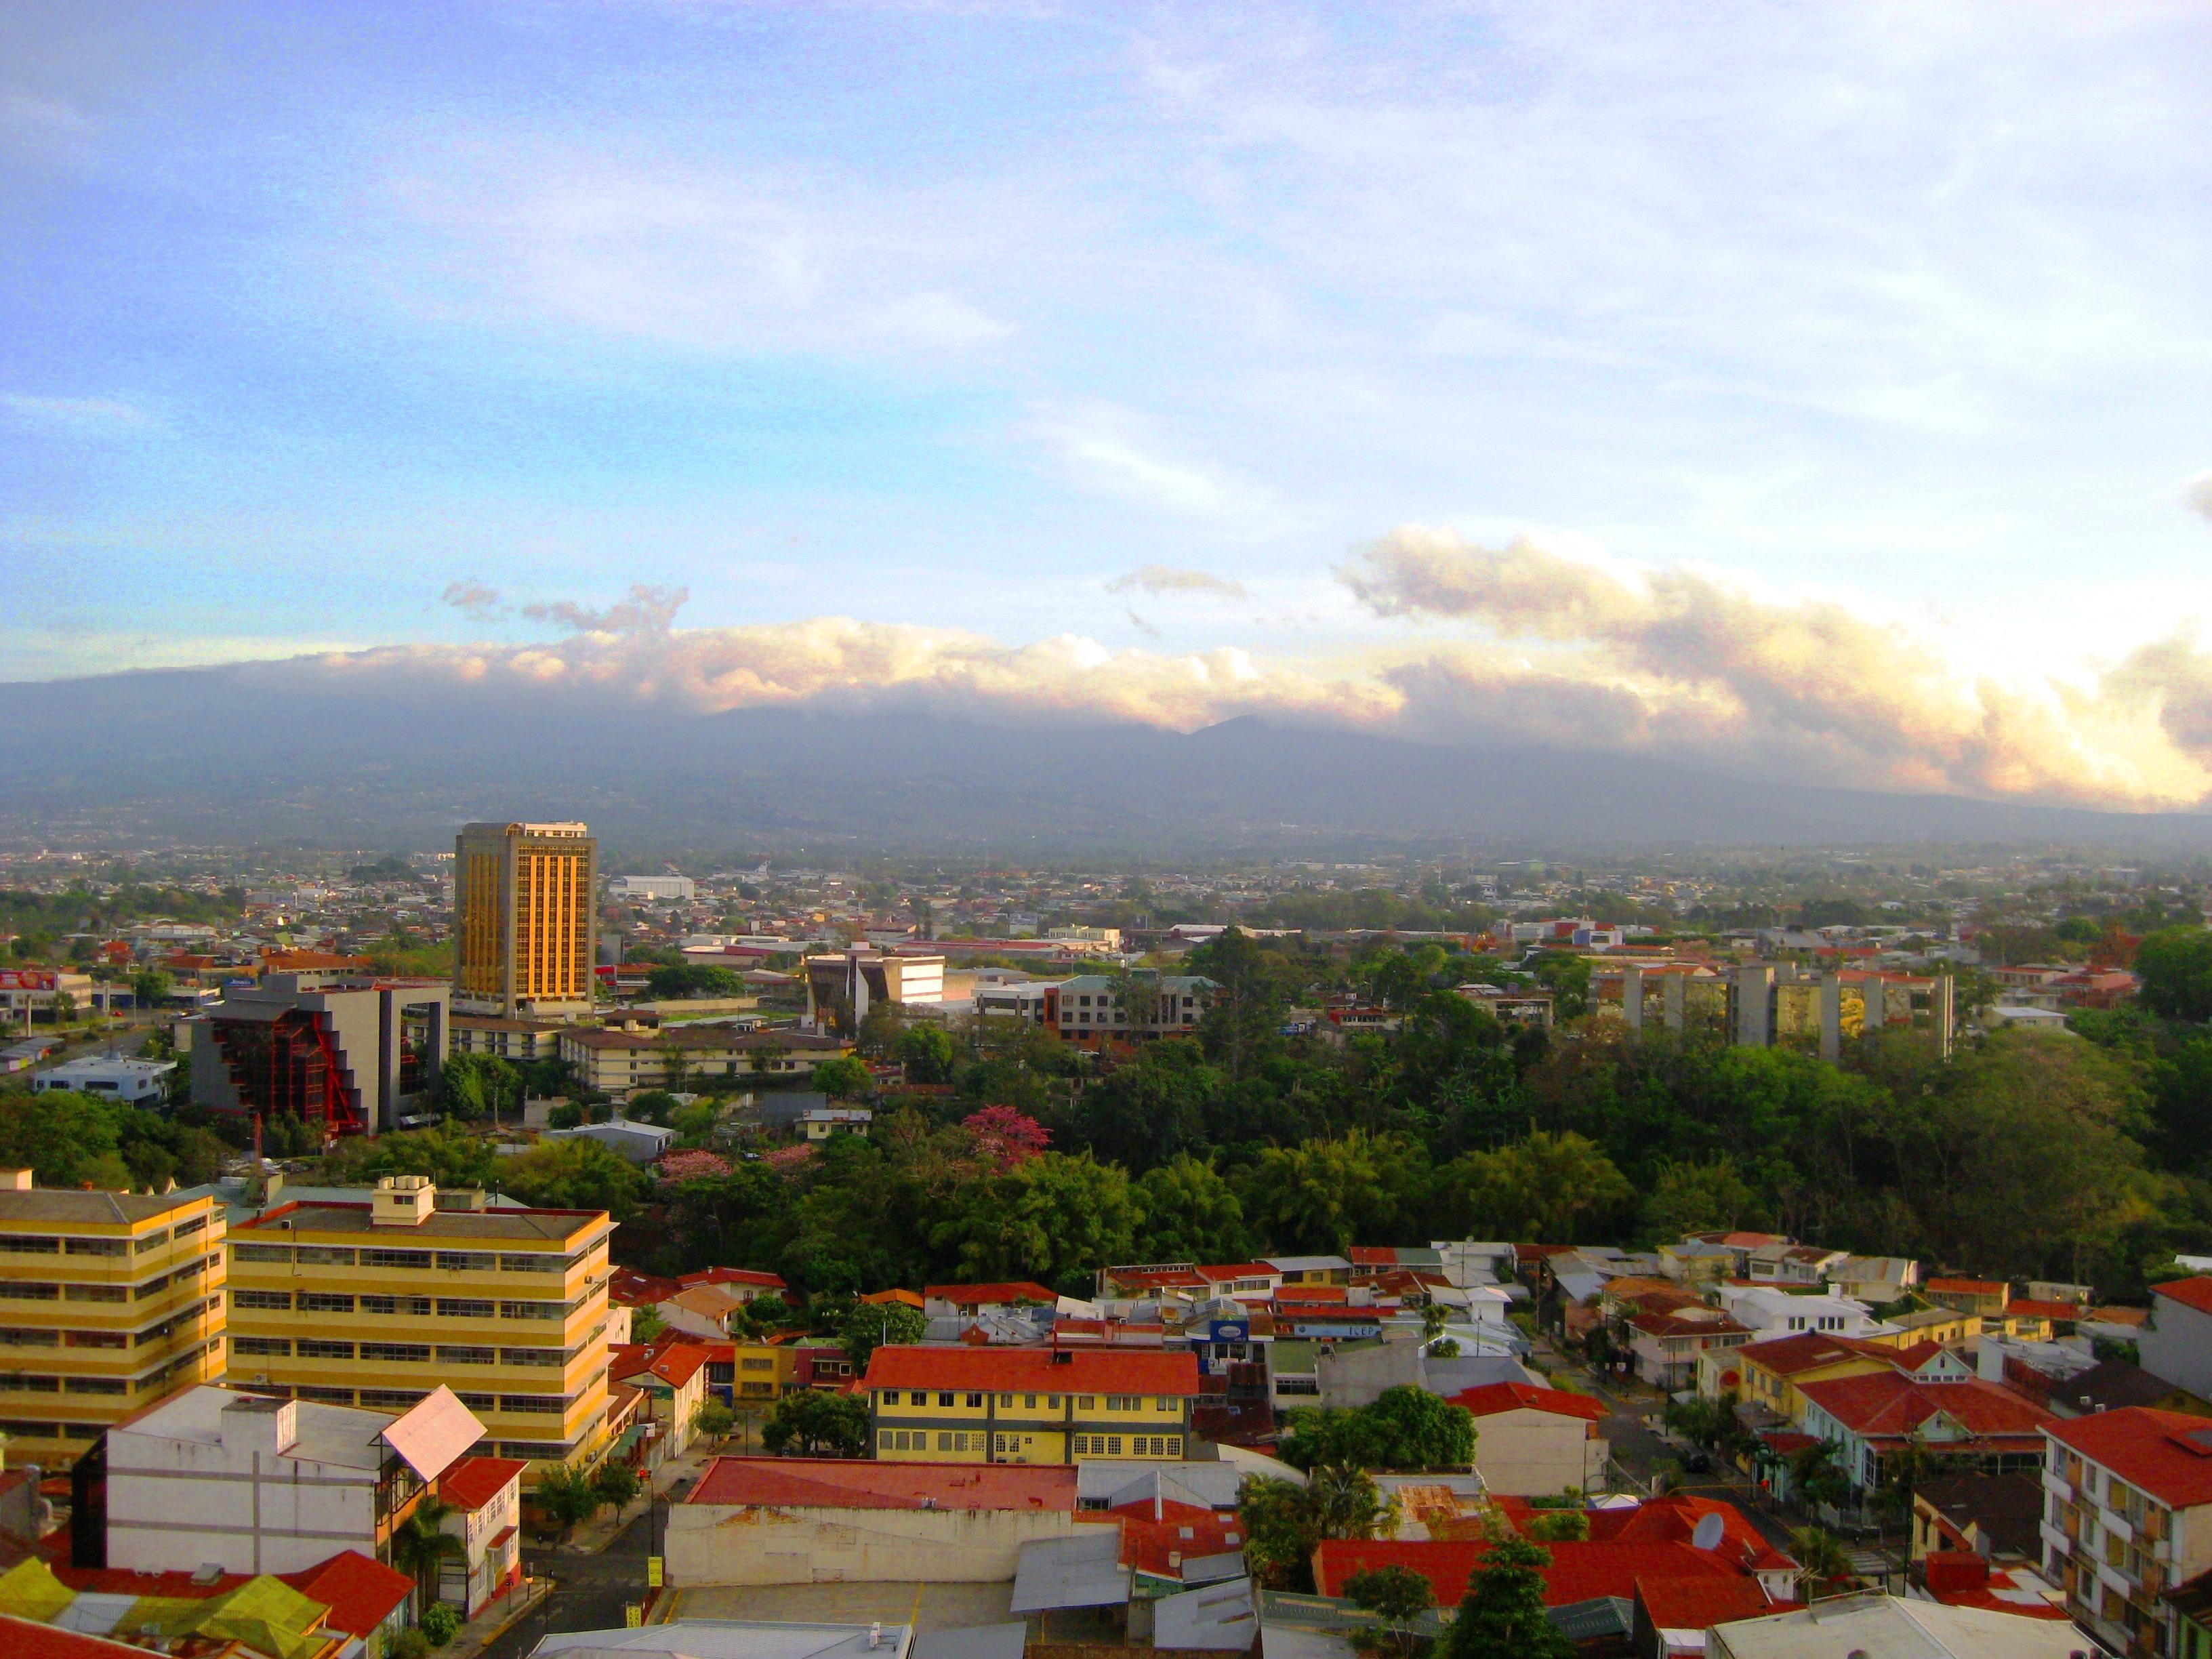 The city of San Jose, Costa Rica.